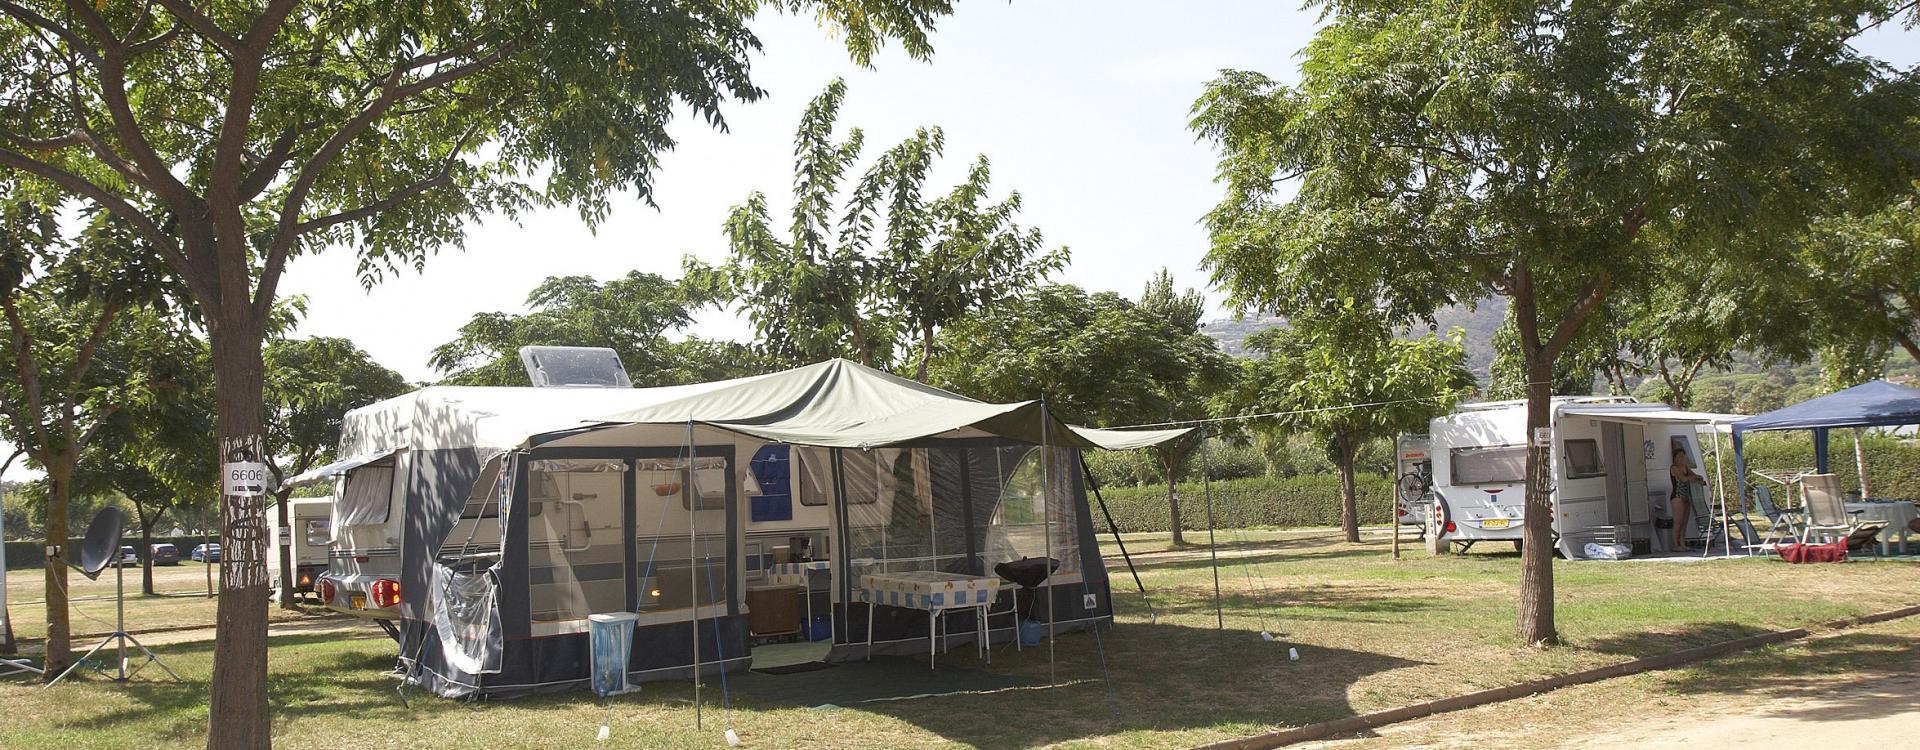 Camping Valldaro - Terrains à Playa de Aro